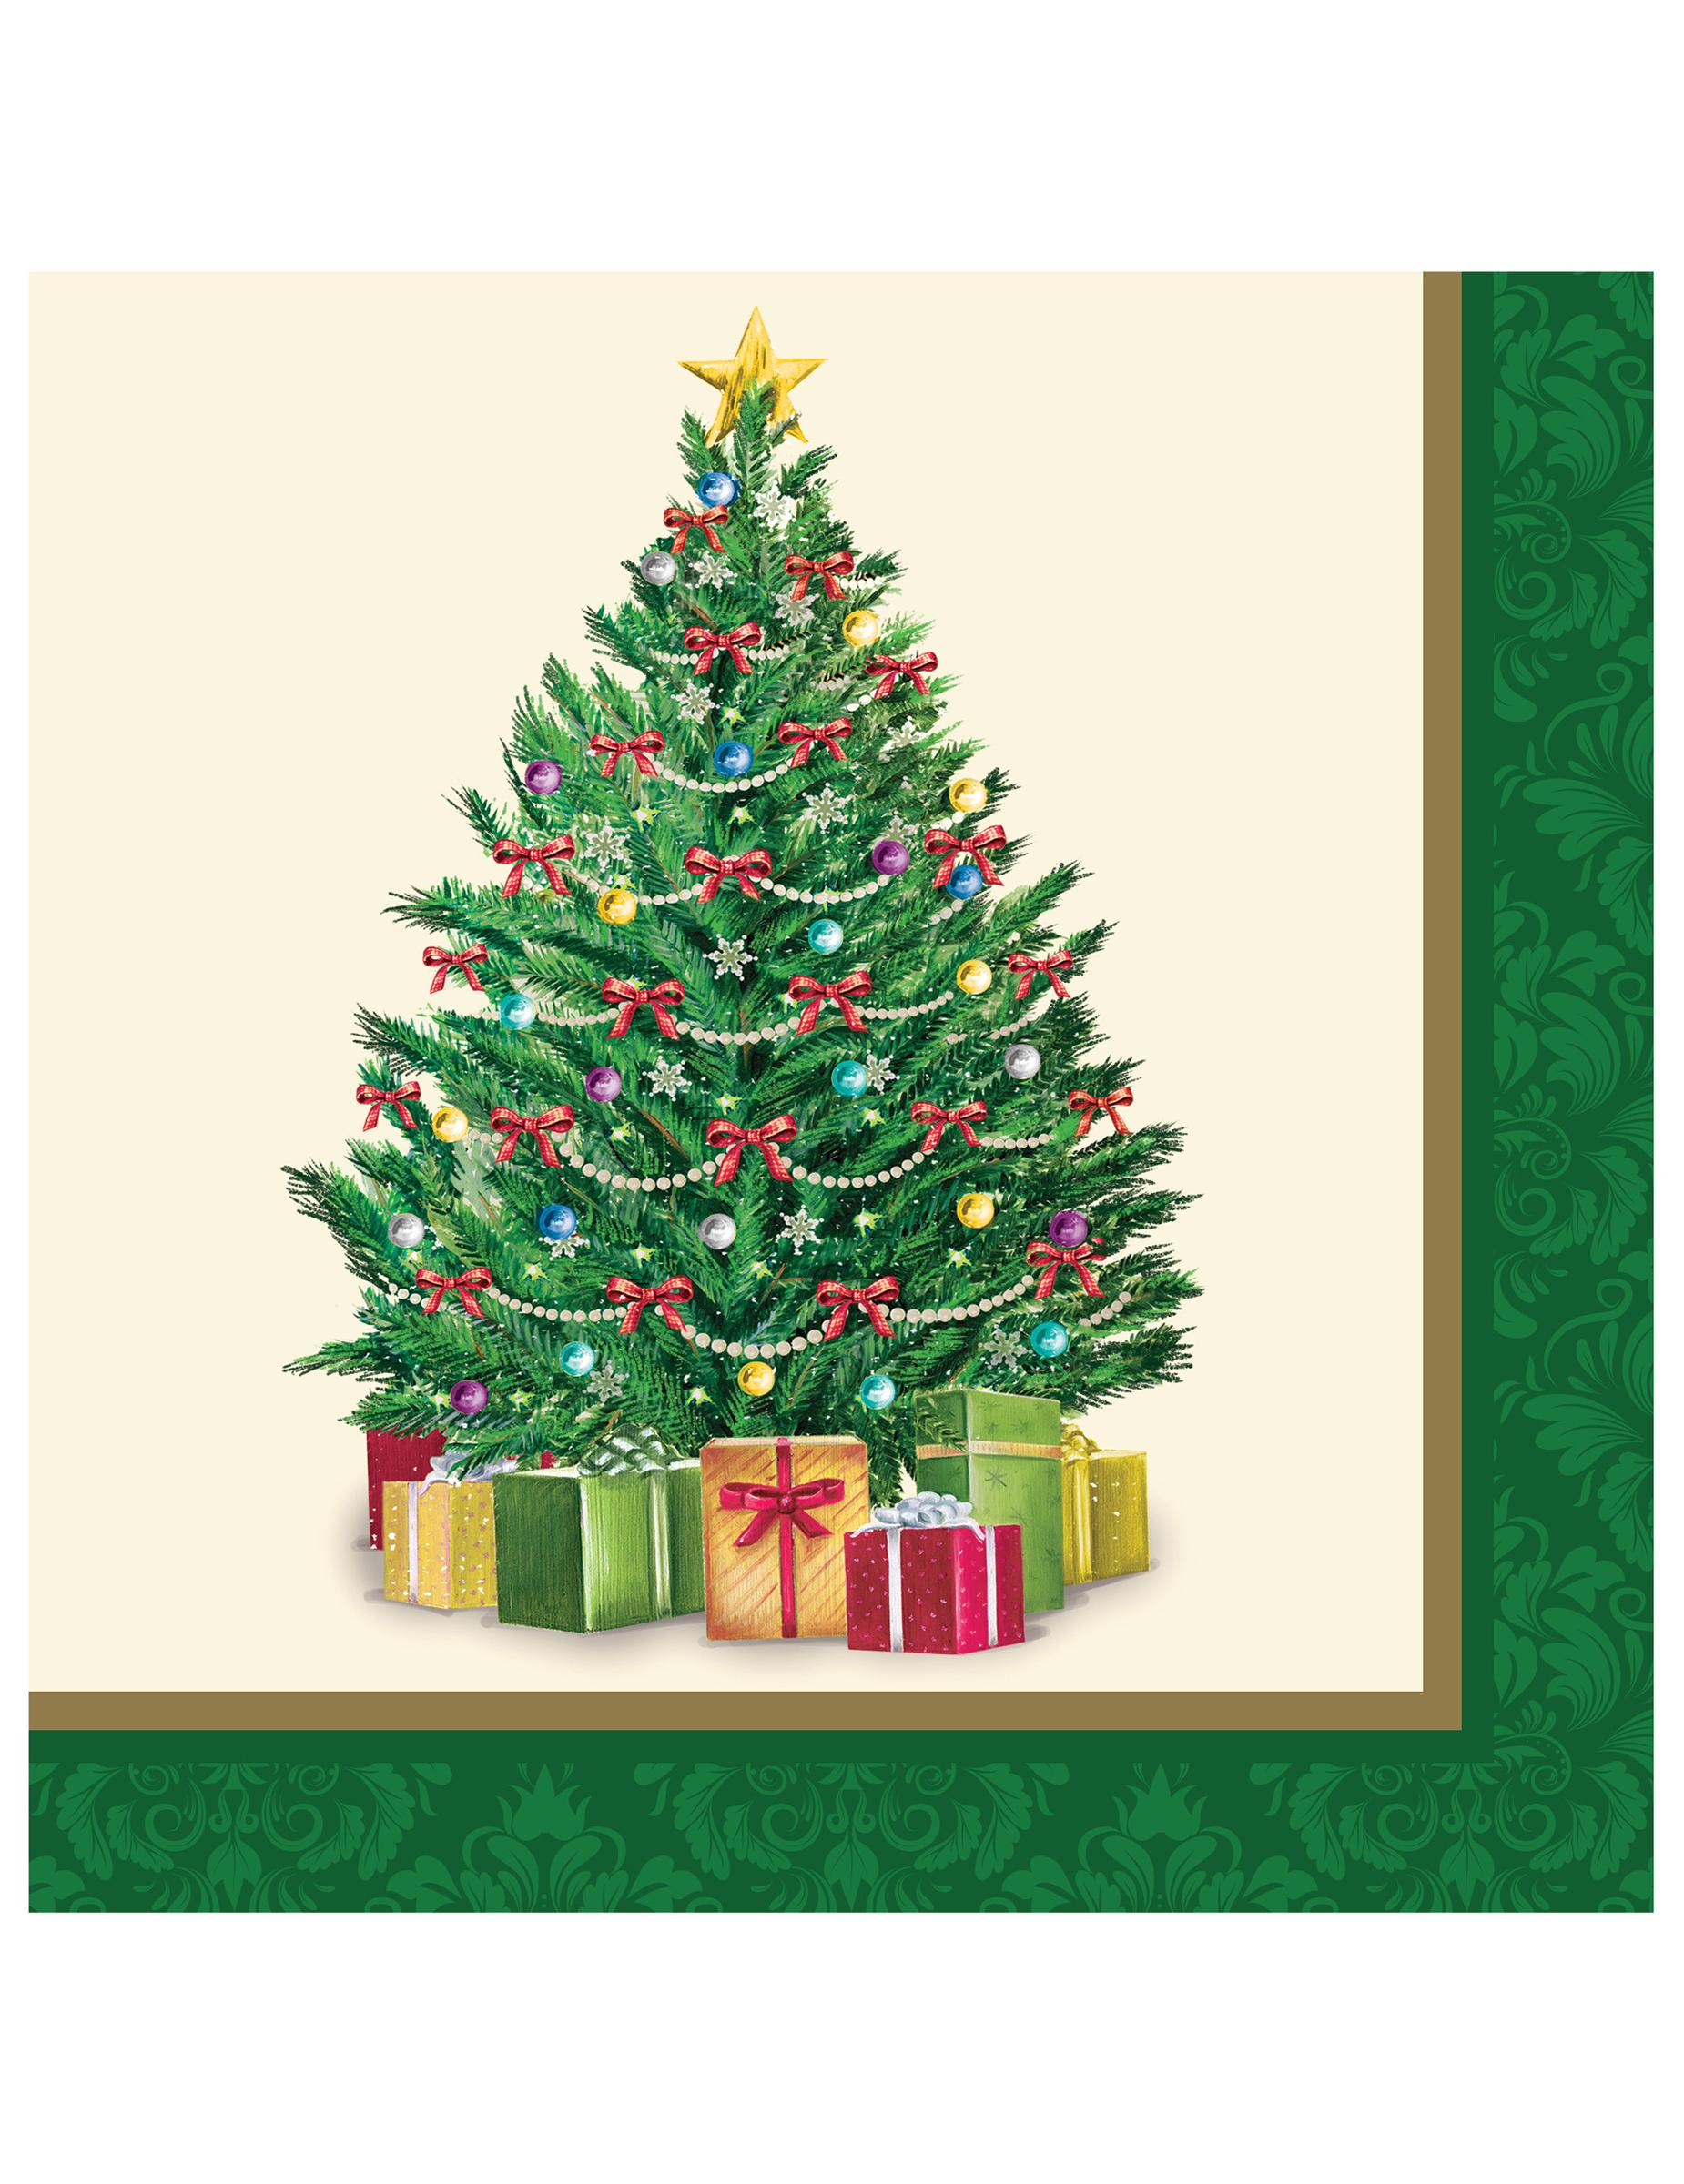 16 tovaglioli di carta abete di natale addobbi e vestiti di carnevale online vegaoo - Tovaglioli di carta decorati ...